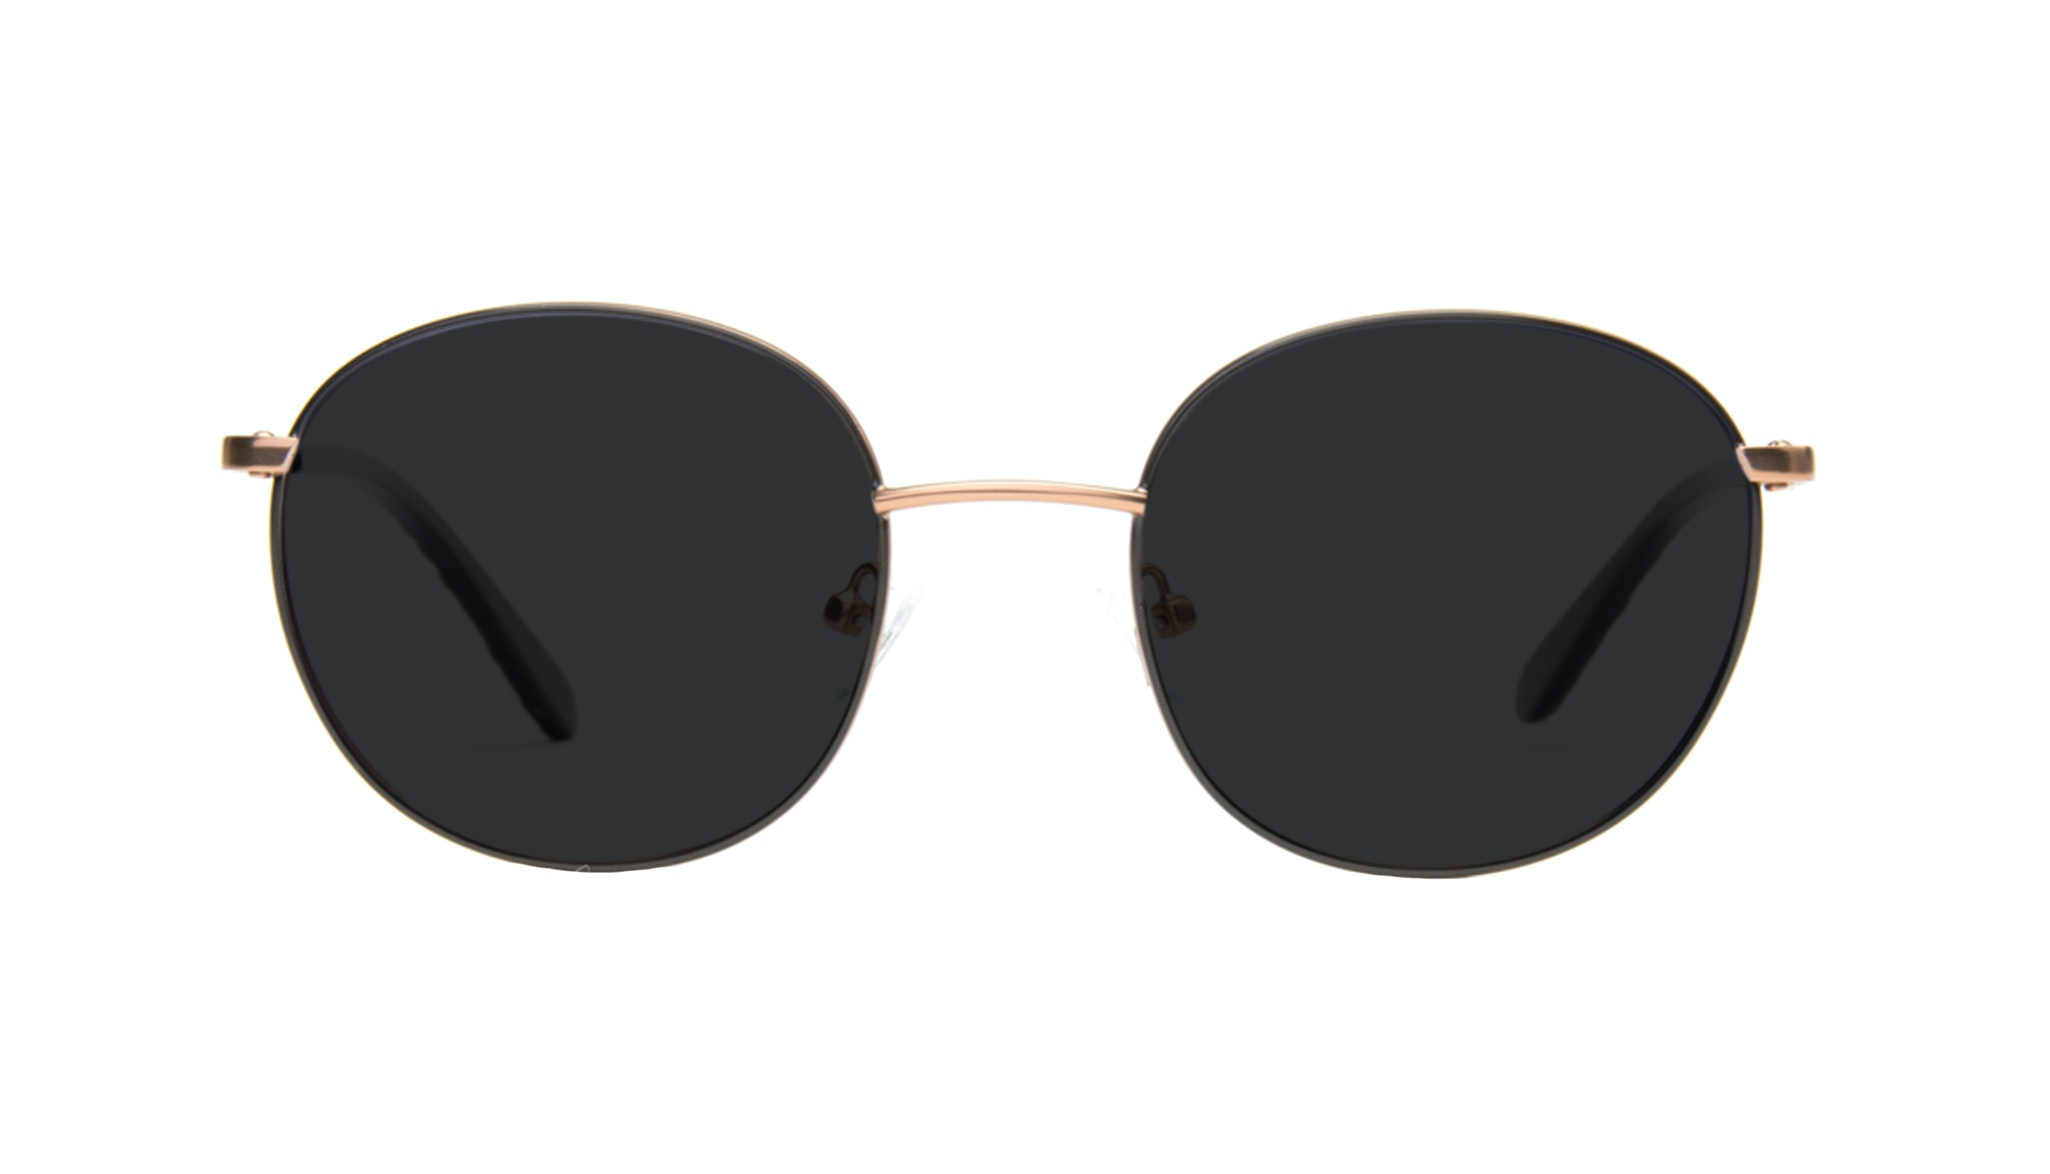 Affordable Fashion Glasses Round Sunglasses Women Joy Black Copper Front